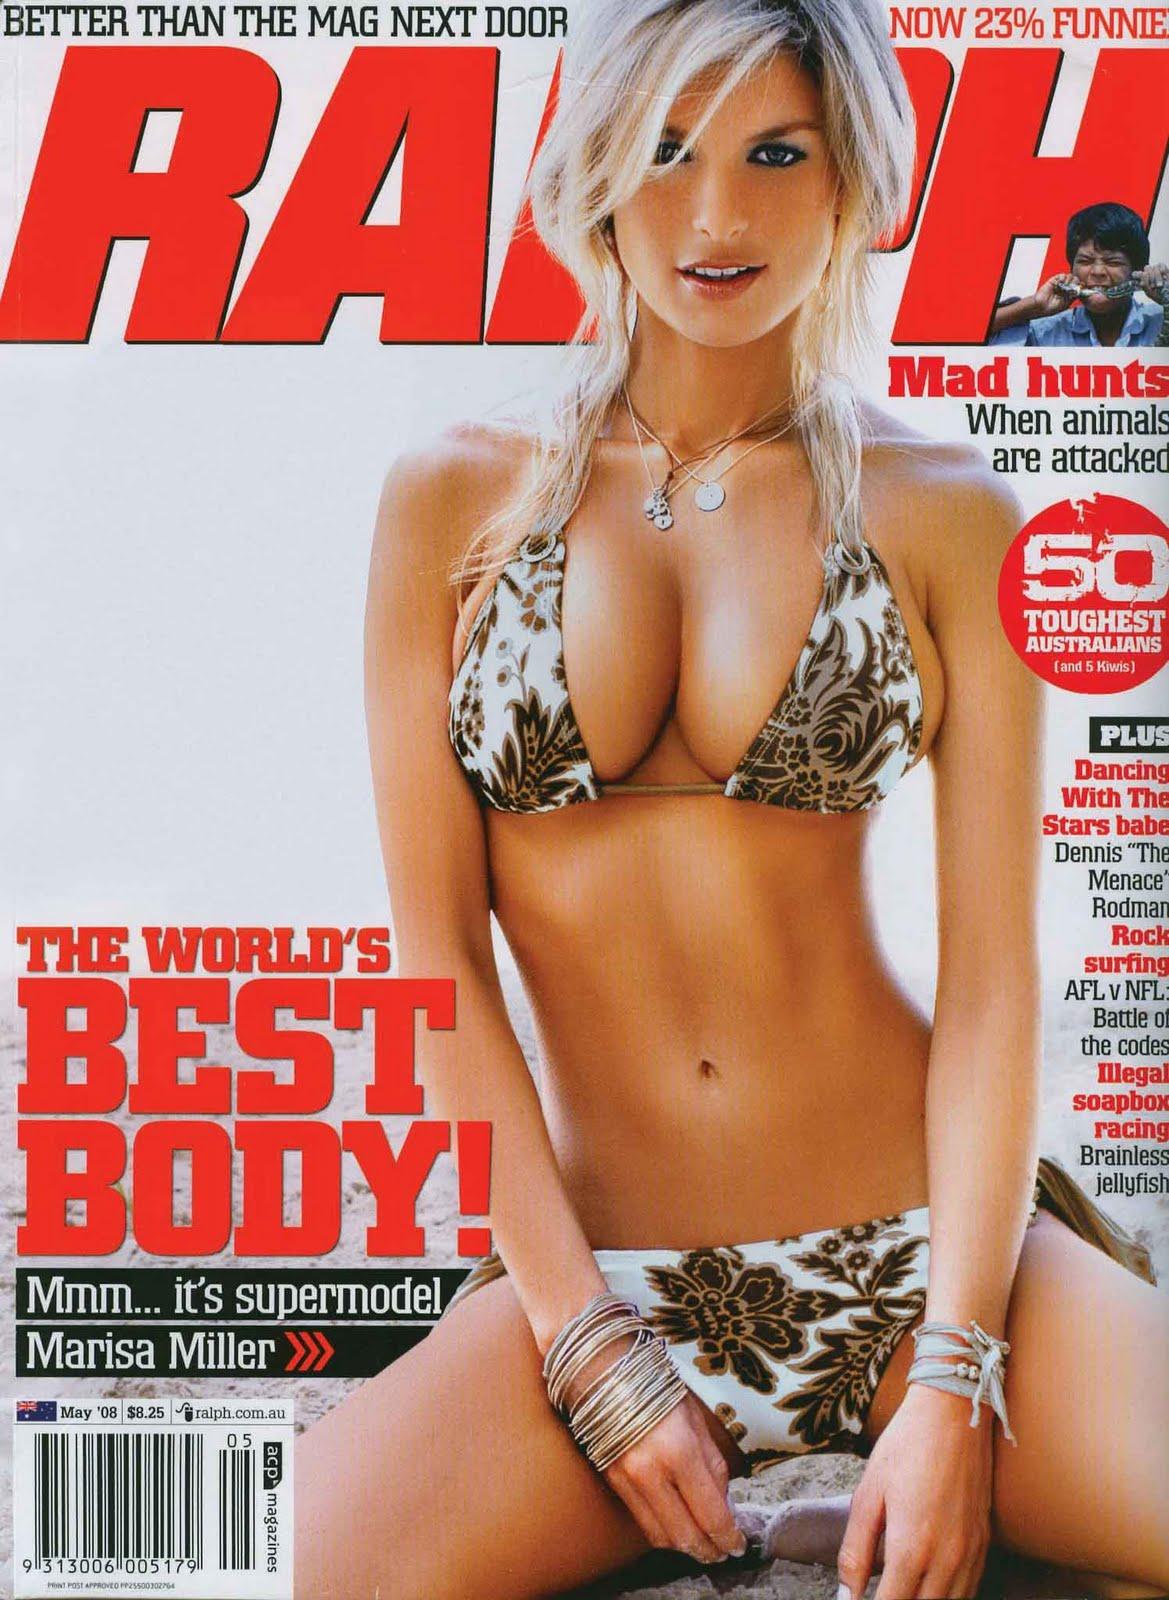 http://1.bp.blogspot.com/-mAihmO8RyQ0/Td_1RtF672I/AAAAAAAACg8/--DM_MNPdjI/s1600/Marisa+Miller+in+Bikini+5.jpg